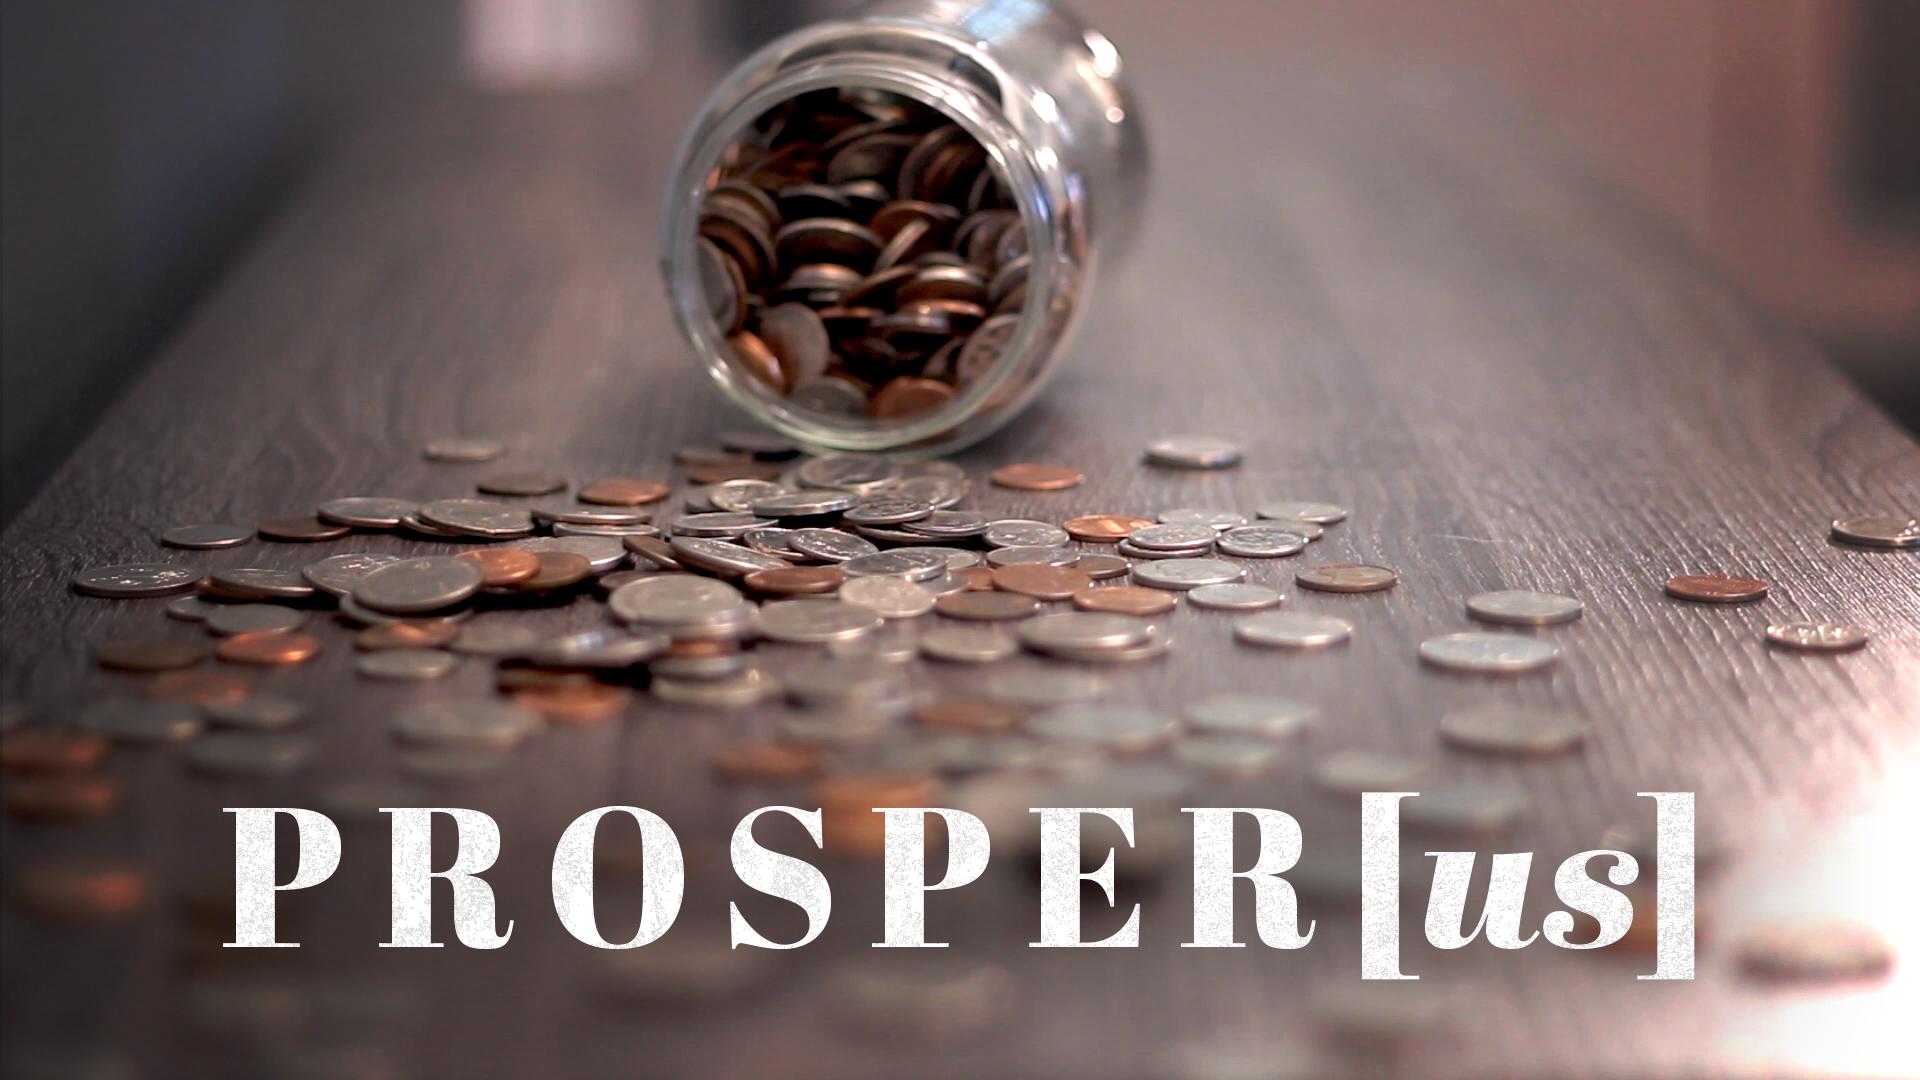 Prosperus_1080.png